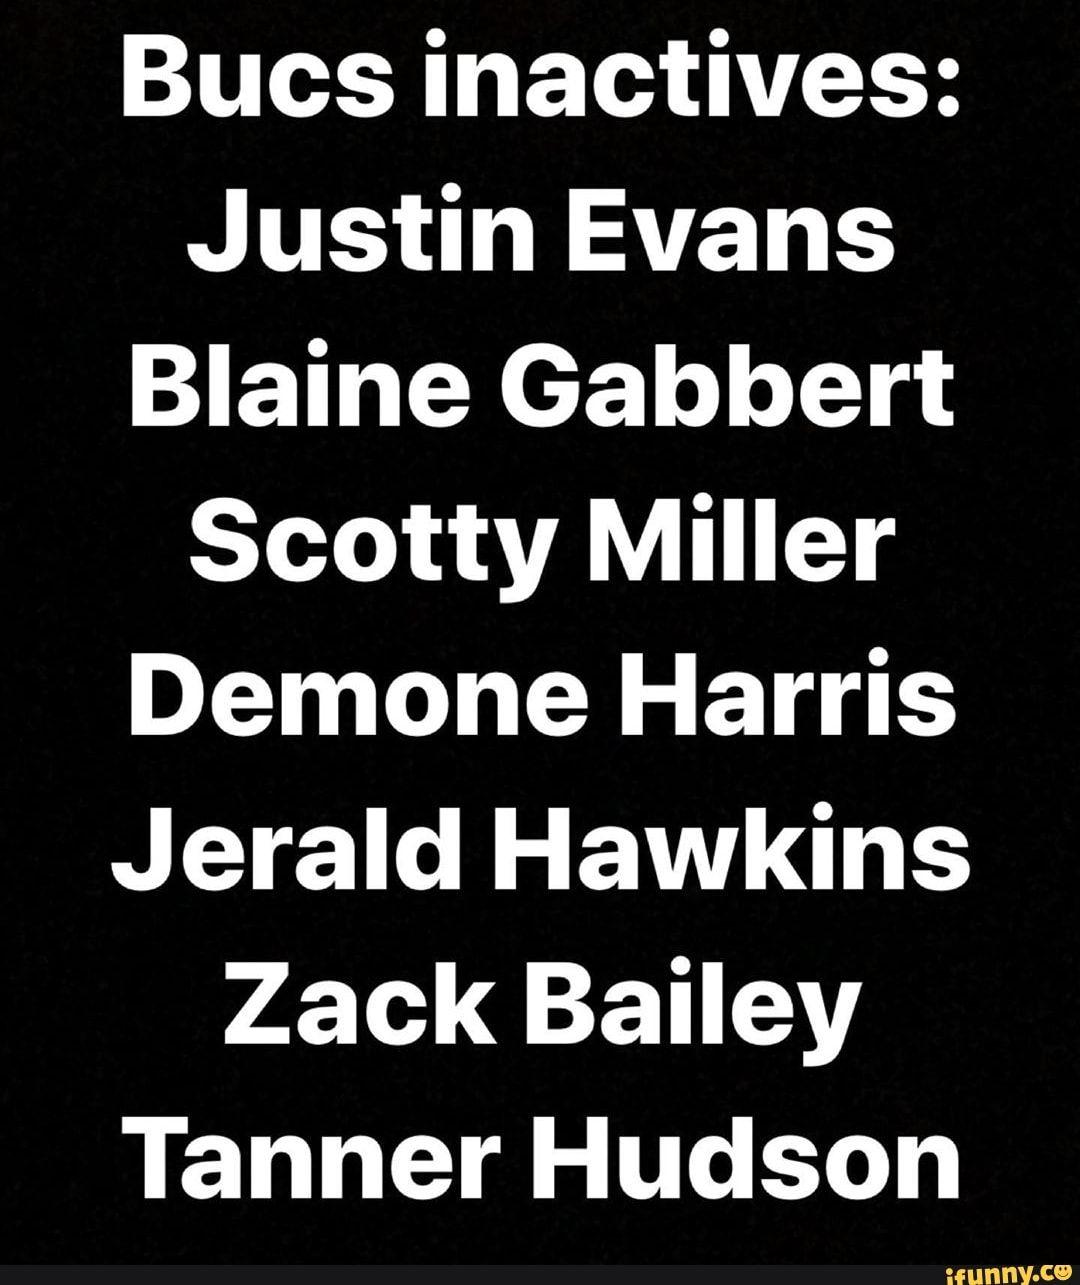 Bucs Inactives Justin Evans Blaine Gabbert Scotty Miller Demone Harris Jerald Hawkins Zack Bailey Tanner Hudson Ifunny Justin Evans Blaine Gabbert Justin Bieber Funny